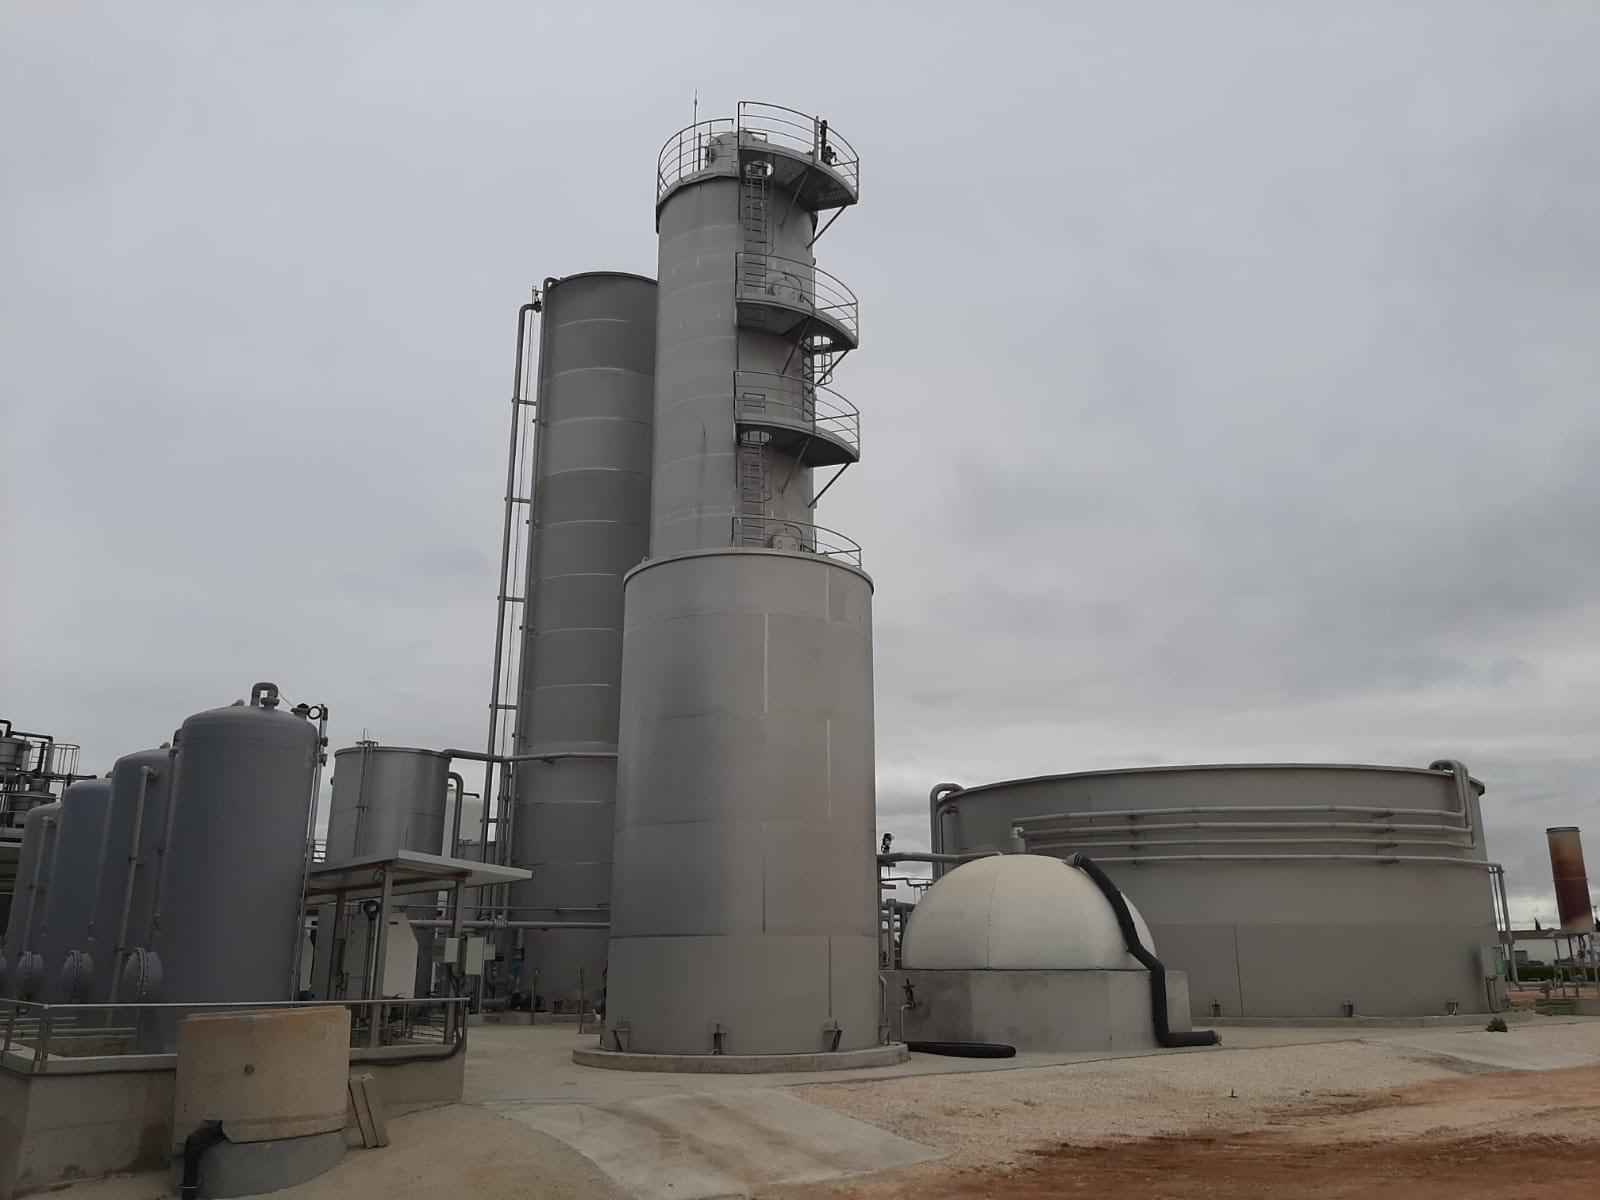 Waste Water Treatment Plant Seville Cadagua Spain